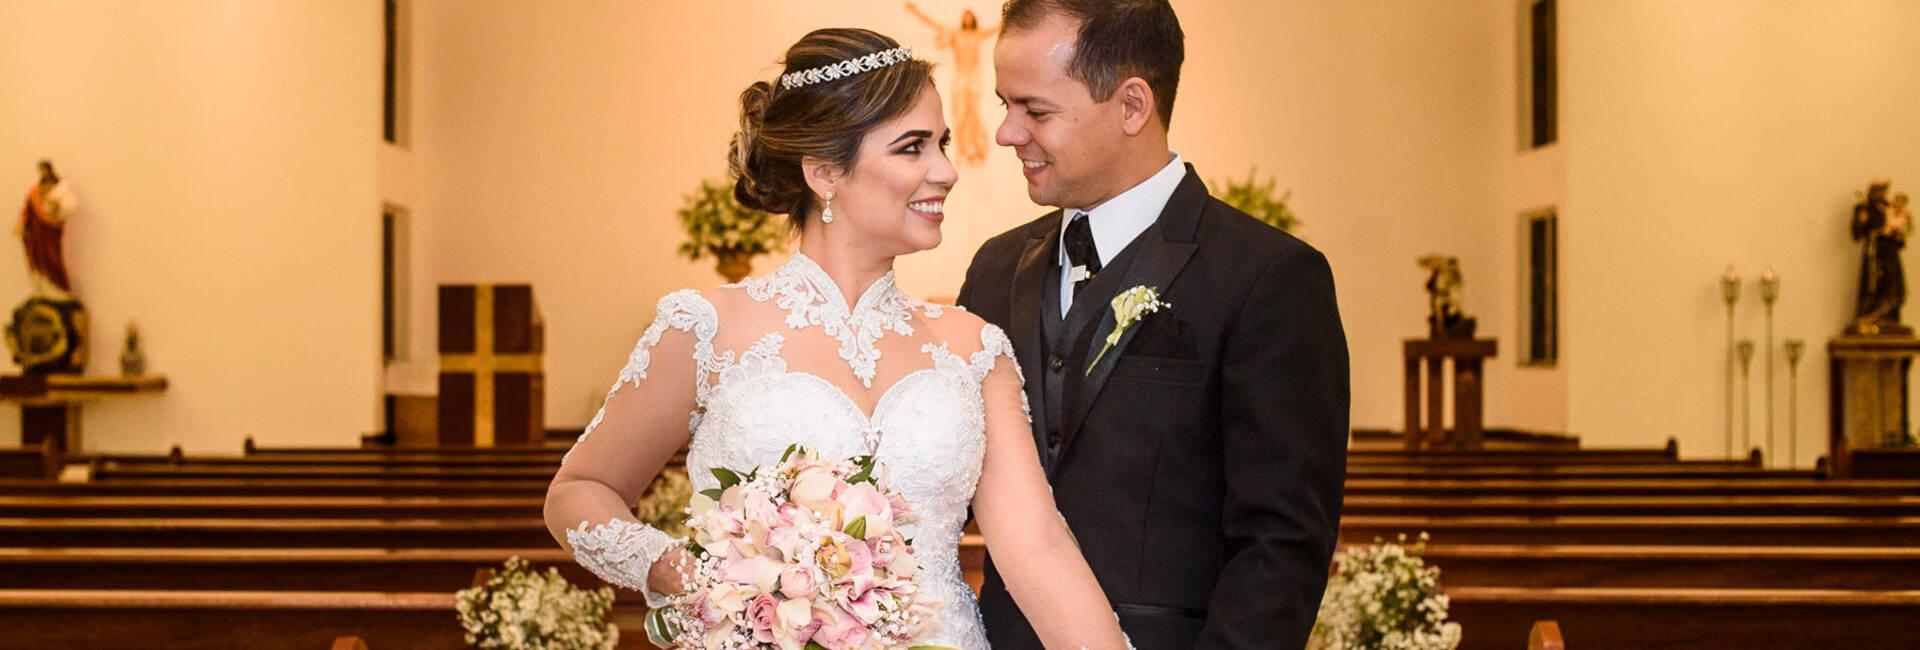 Casamento de Juliana e Gustavo